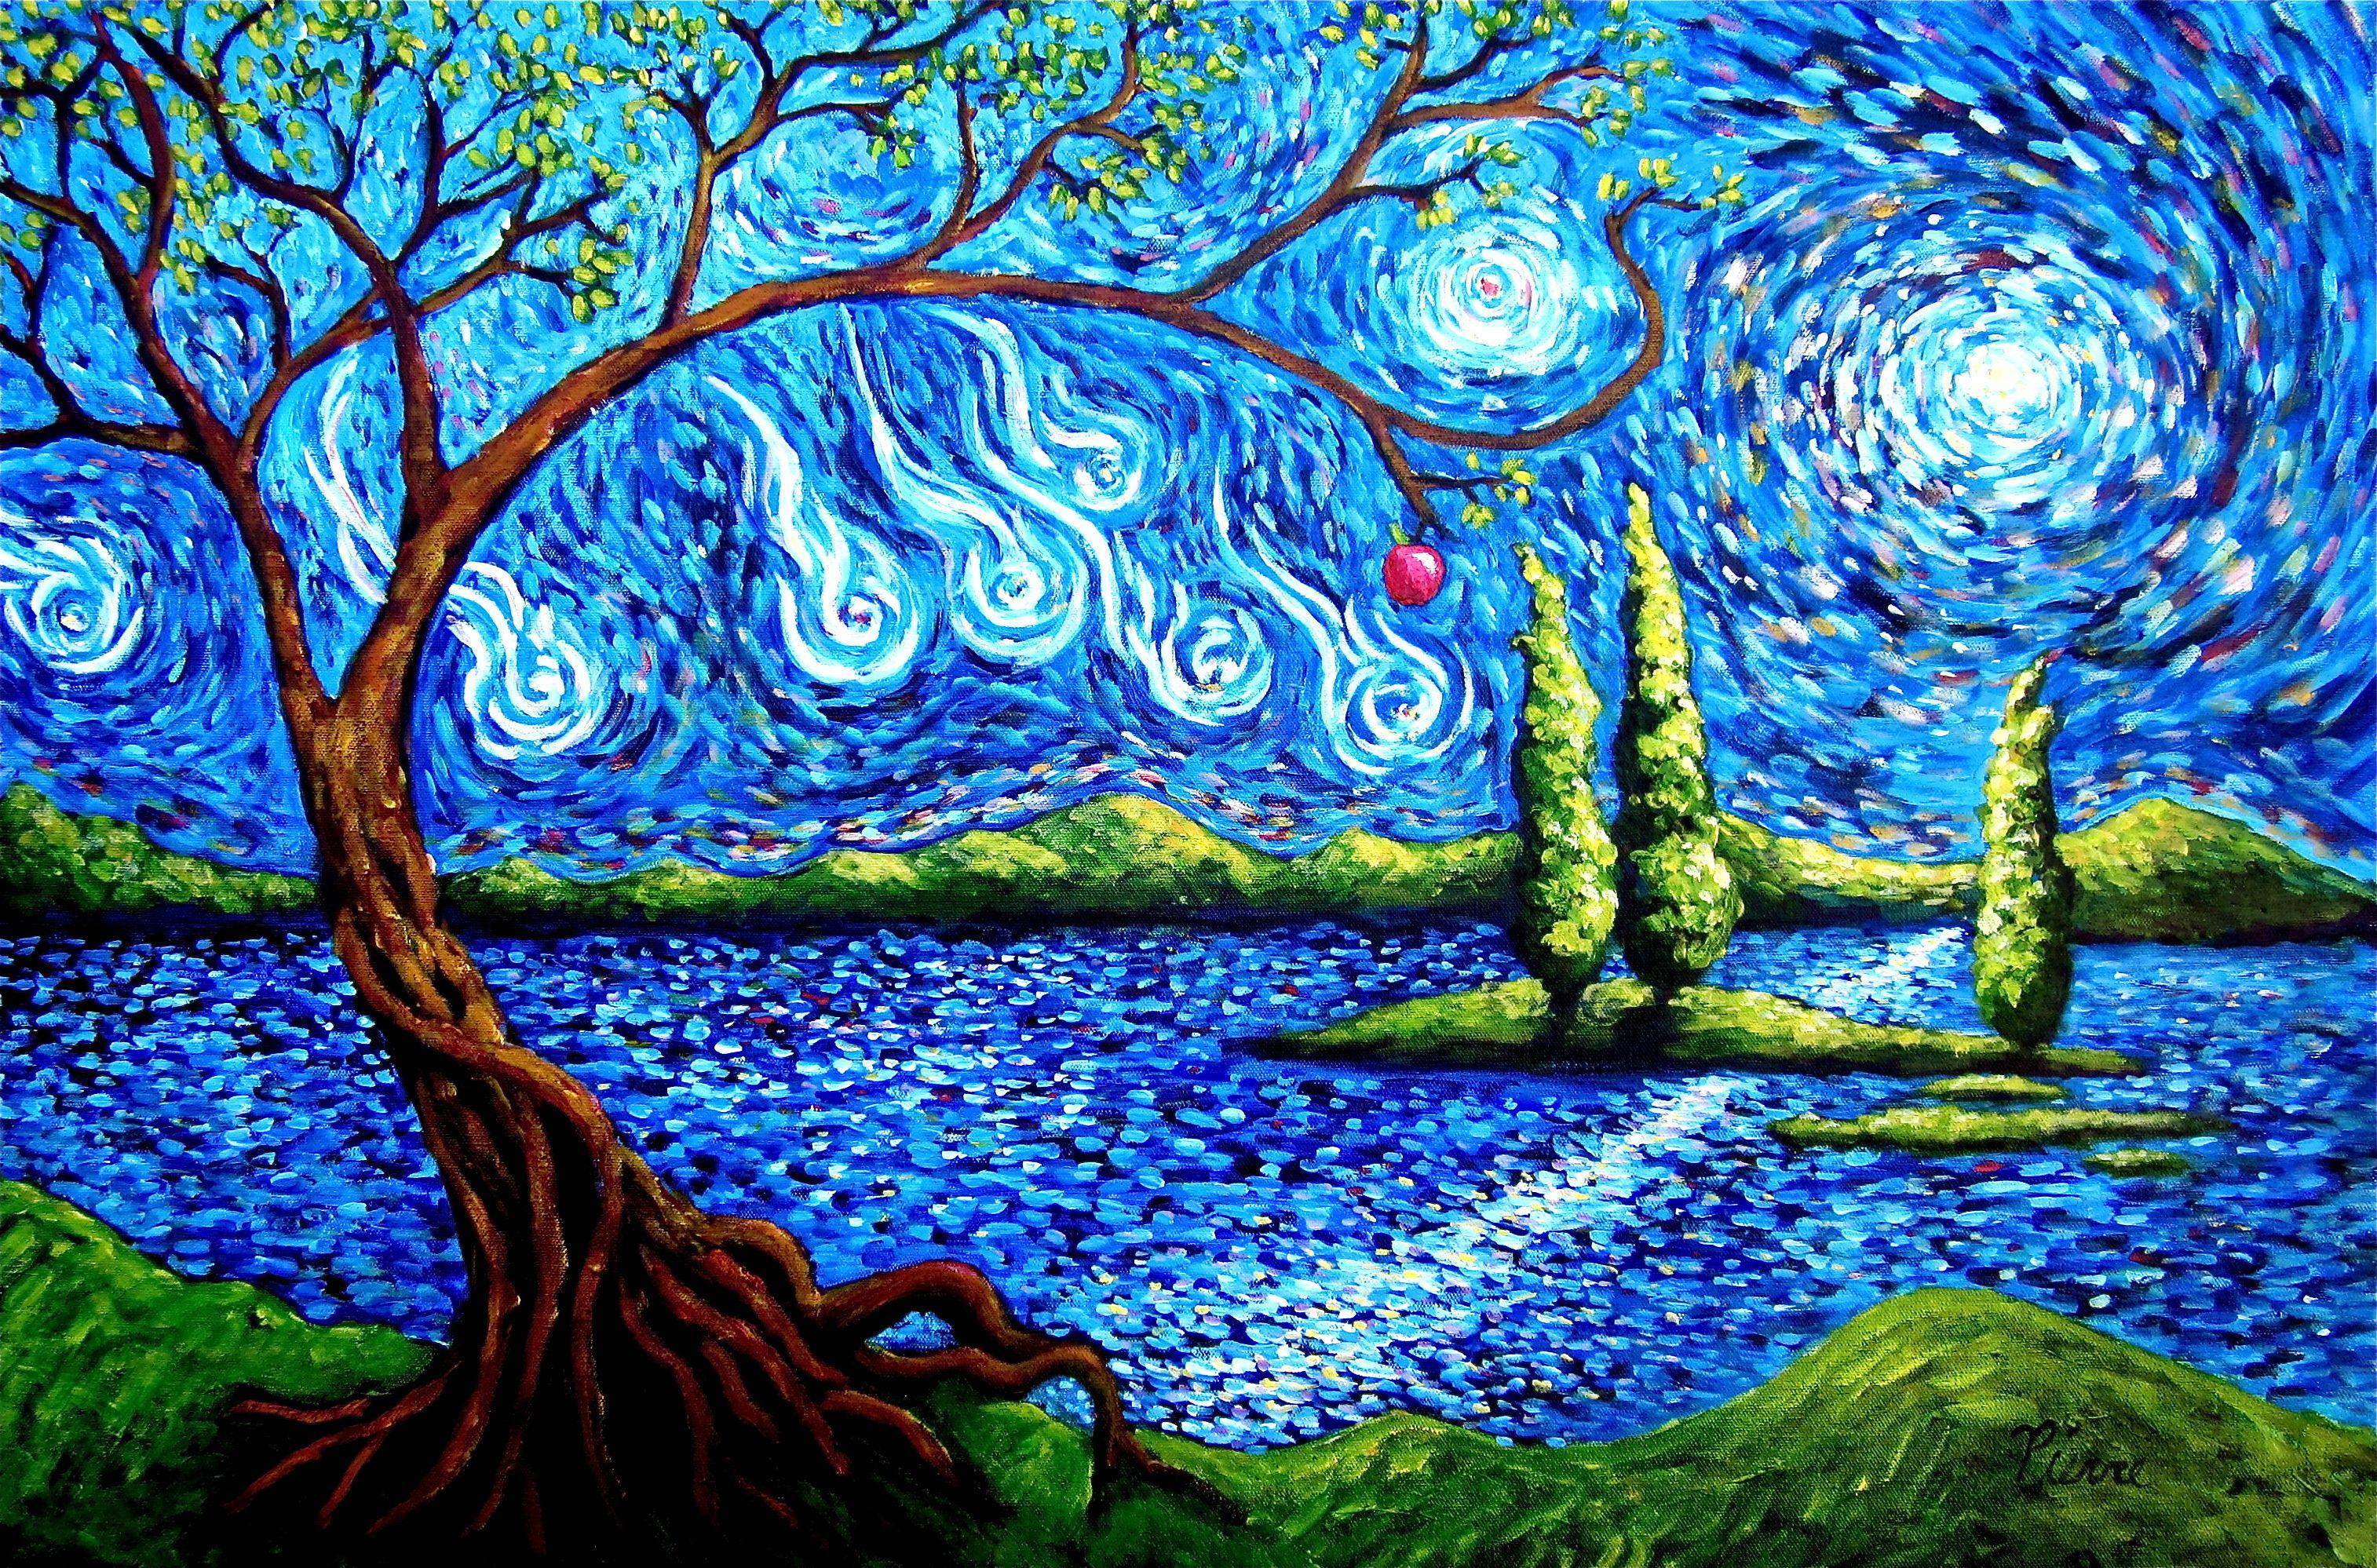 Abstract Art - Artists Feelings and Thoughts   Jango Art ...